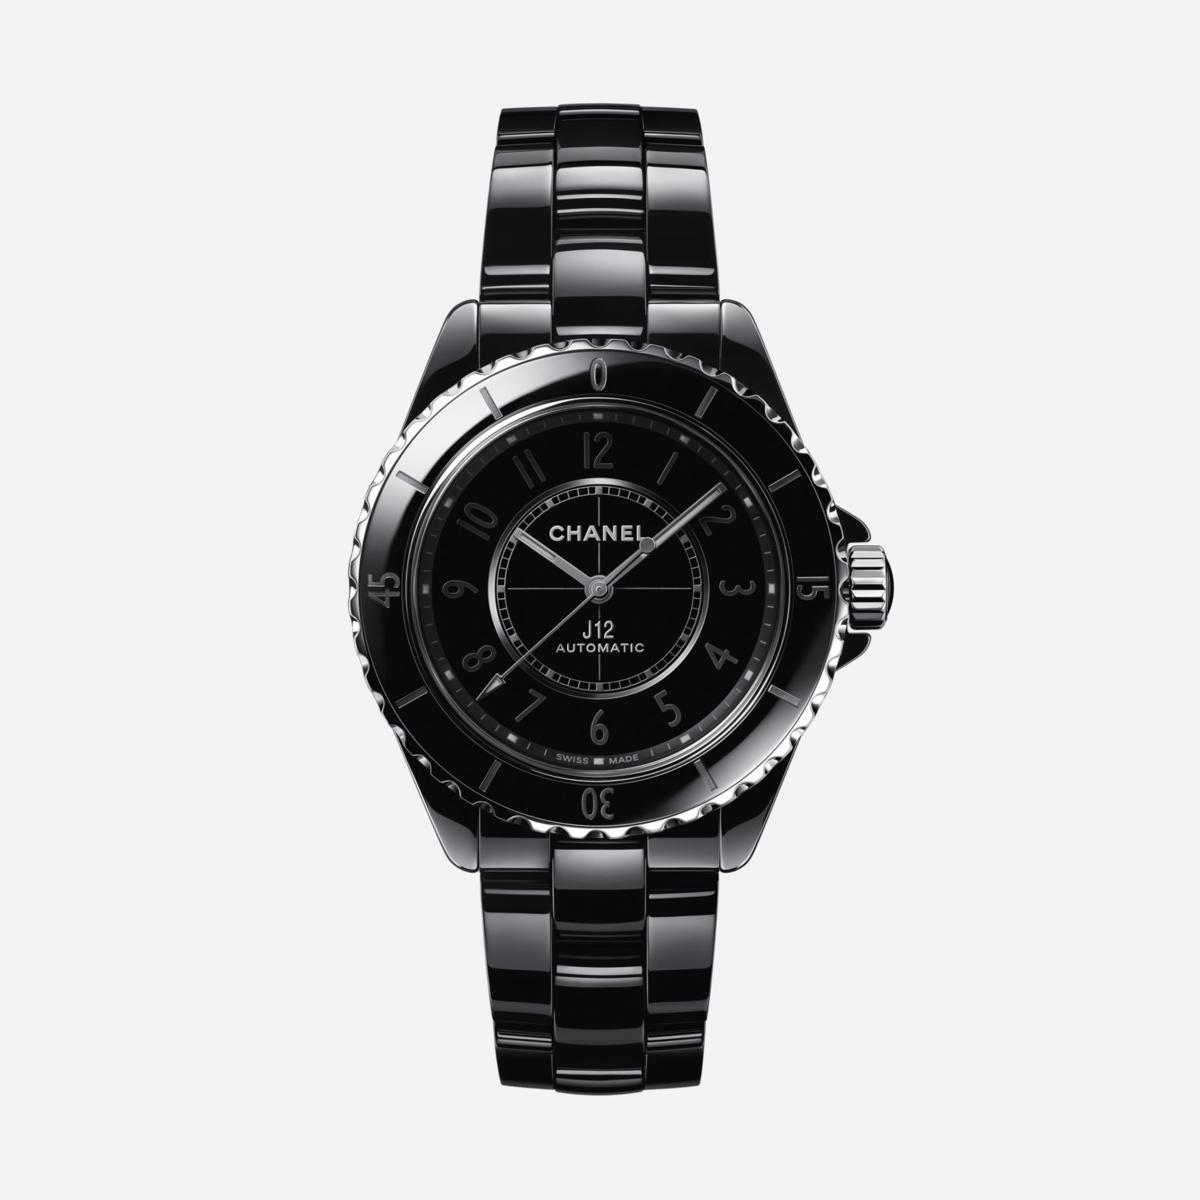 f:id:shirokuma-watch:20200429162410p:plain